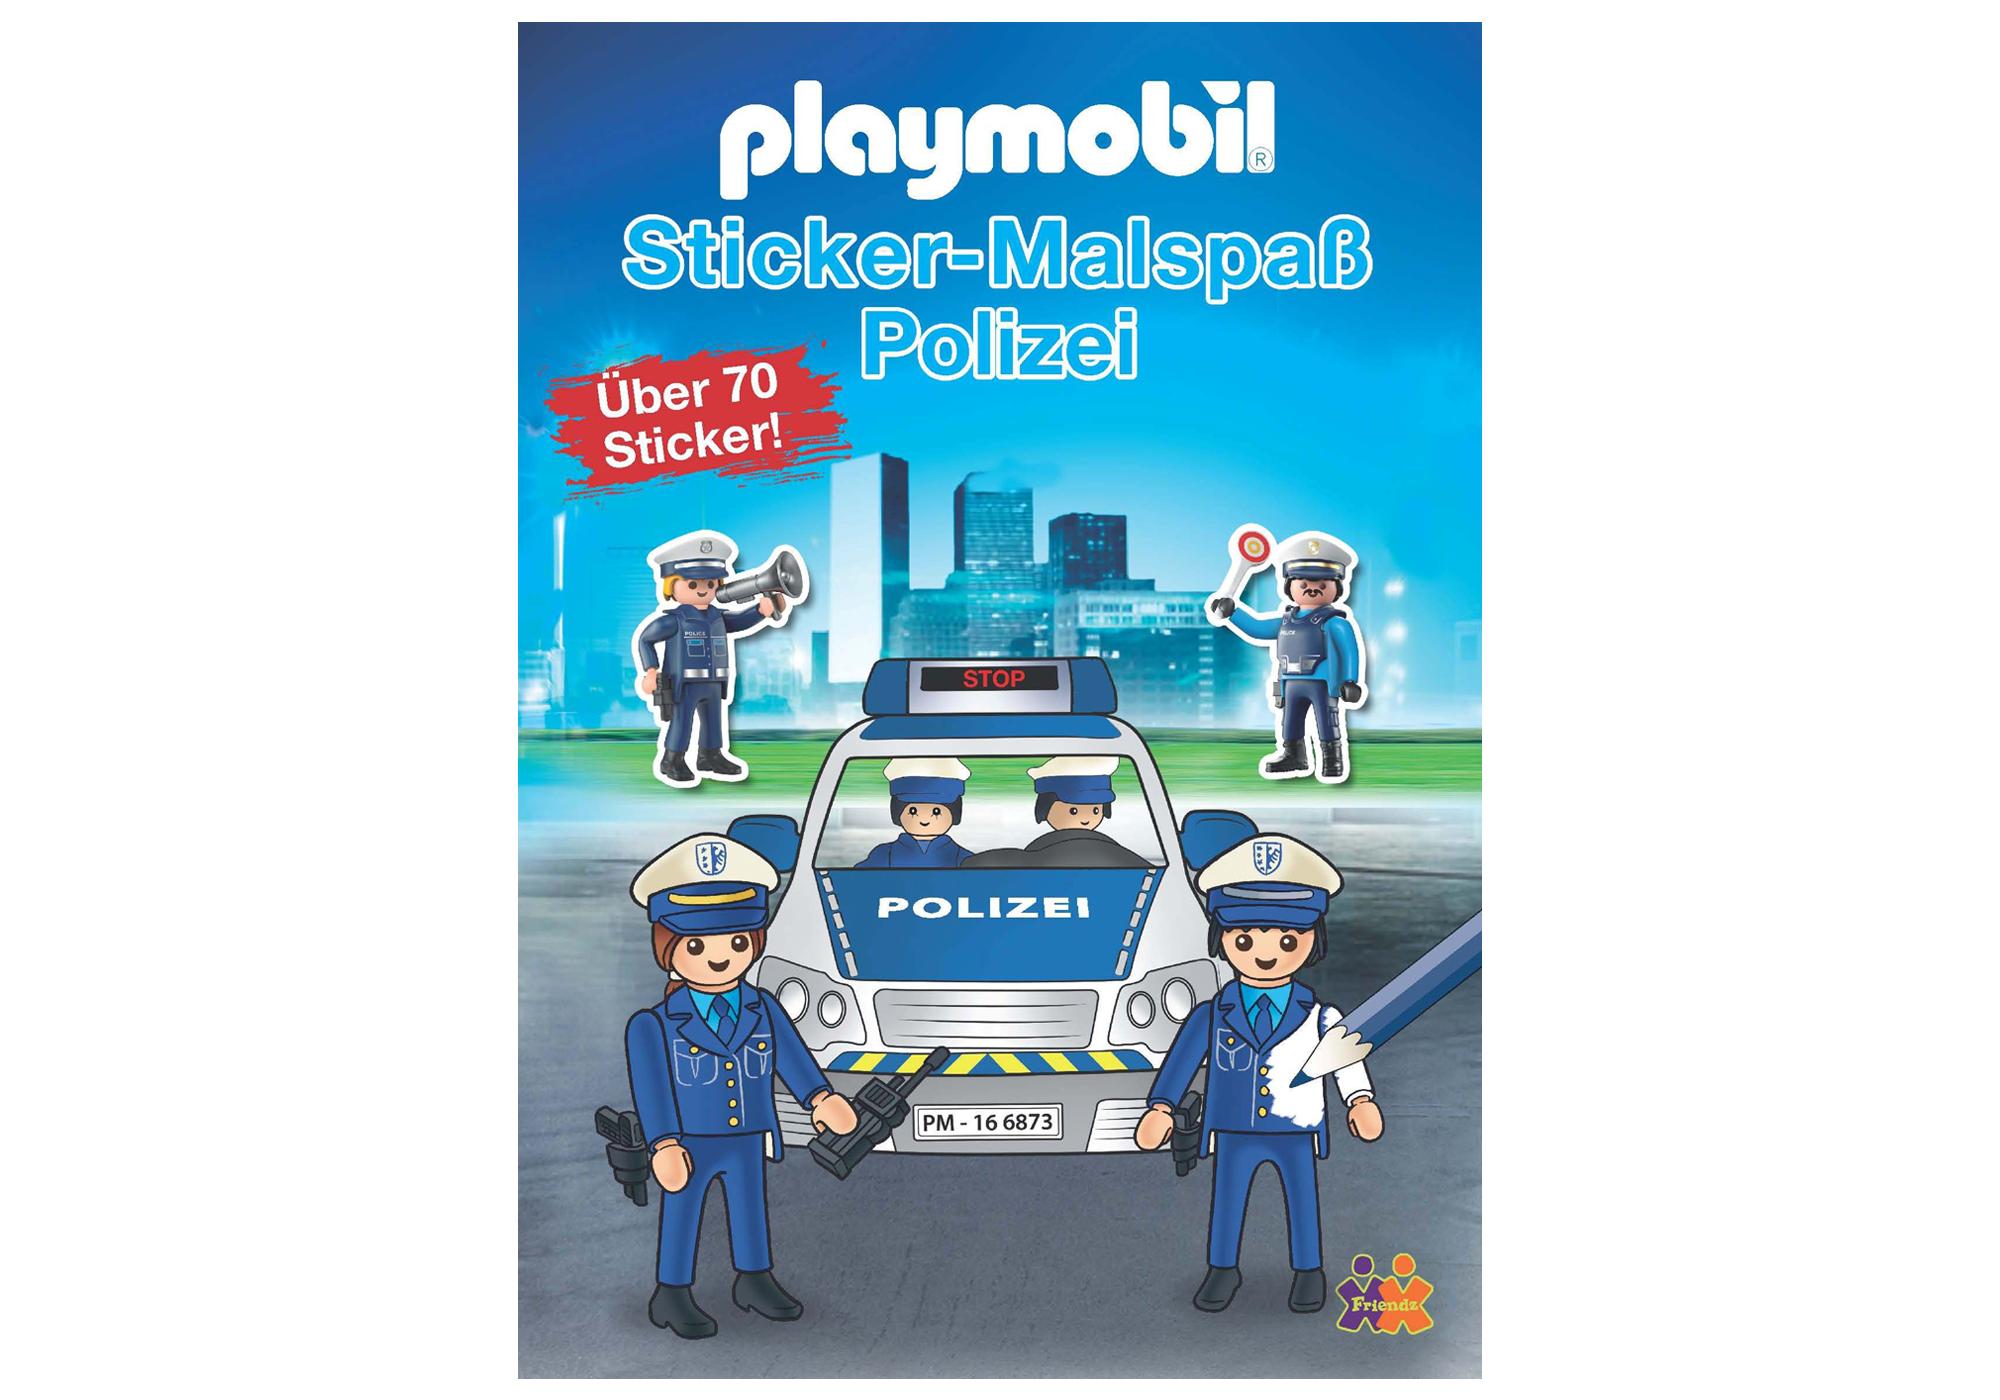 http://media.playmobil.com/i/playmobil/80093_product_detail/Sticker-Malspaß Polizei